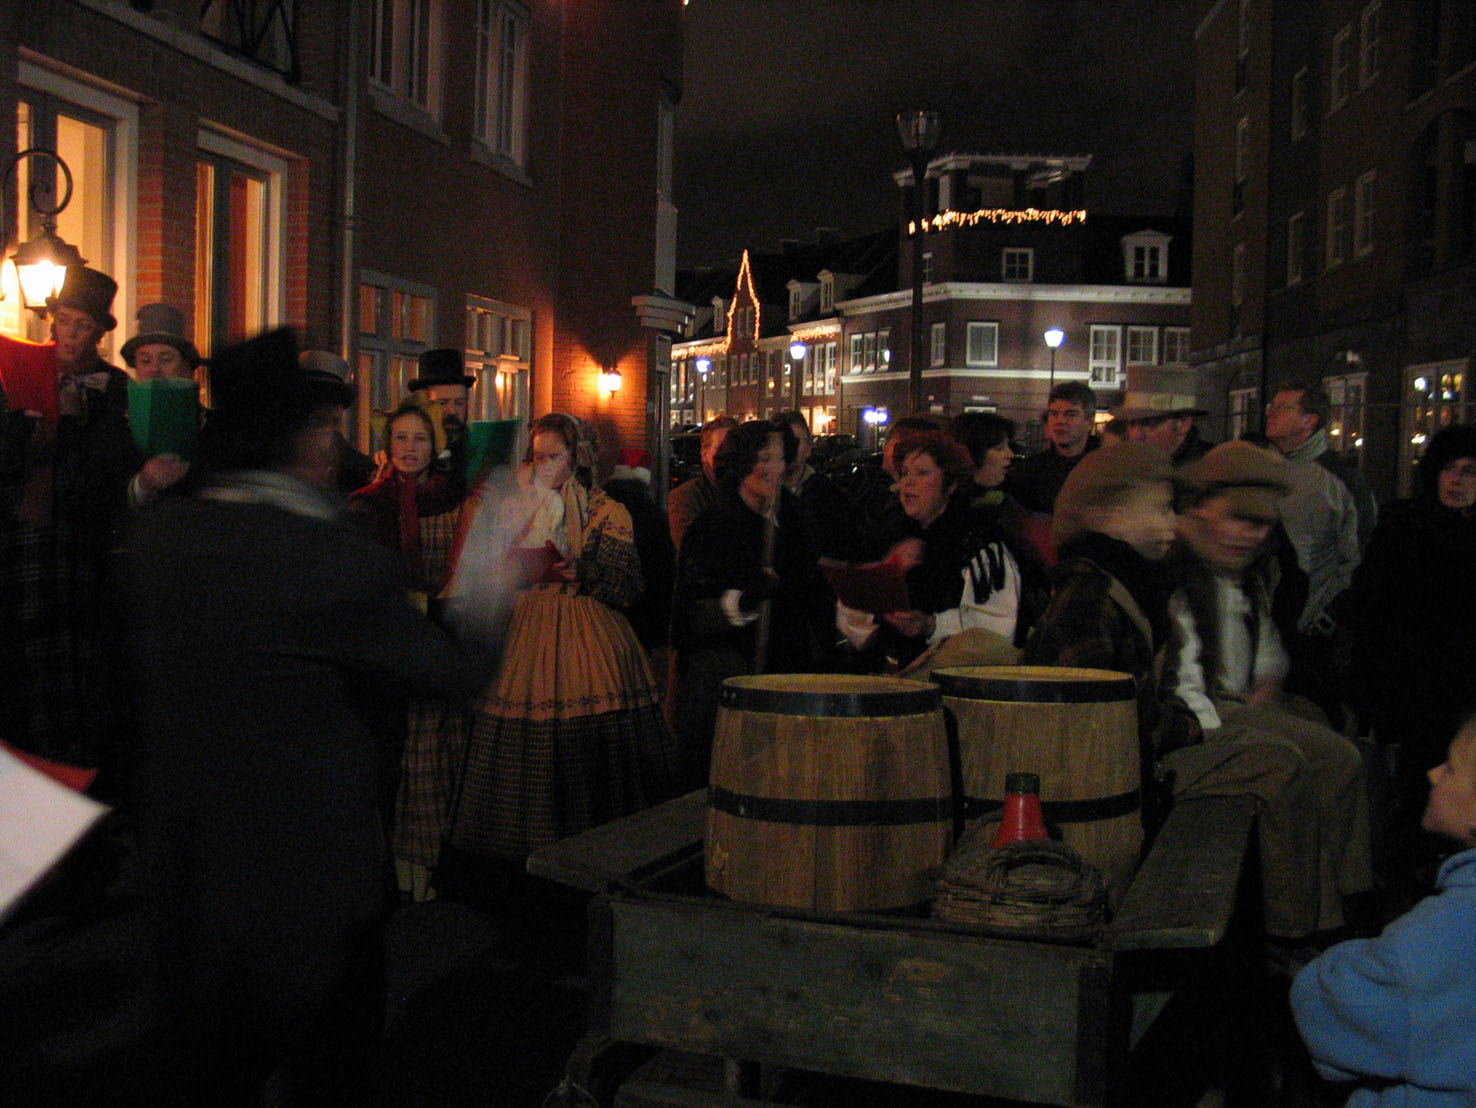 091 - Kerstmarkt Helmond 2003.jpg